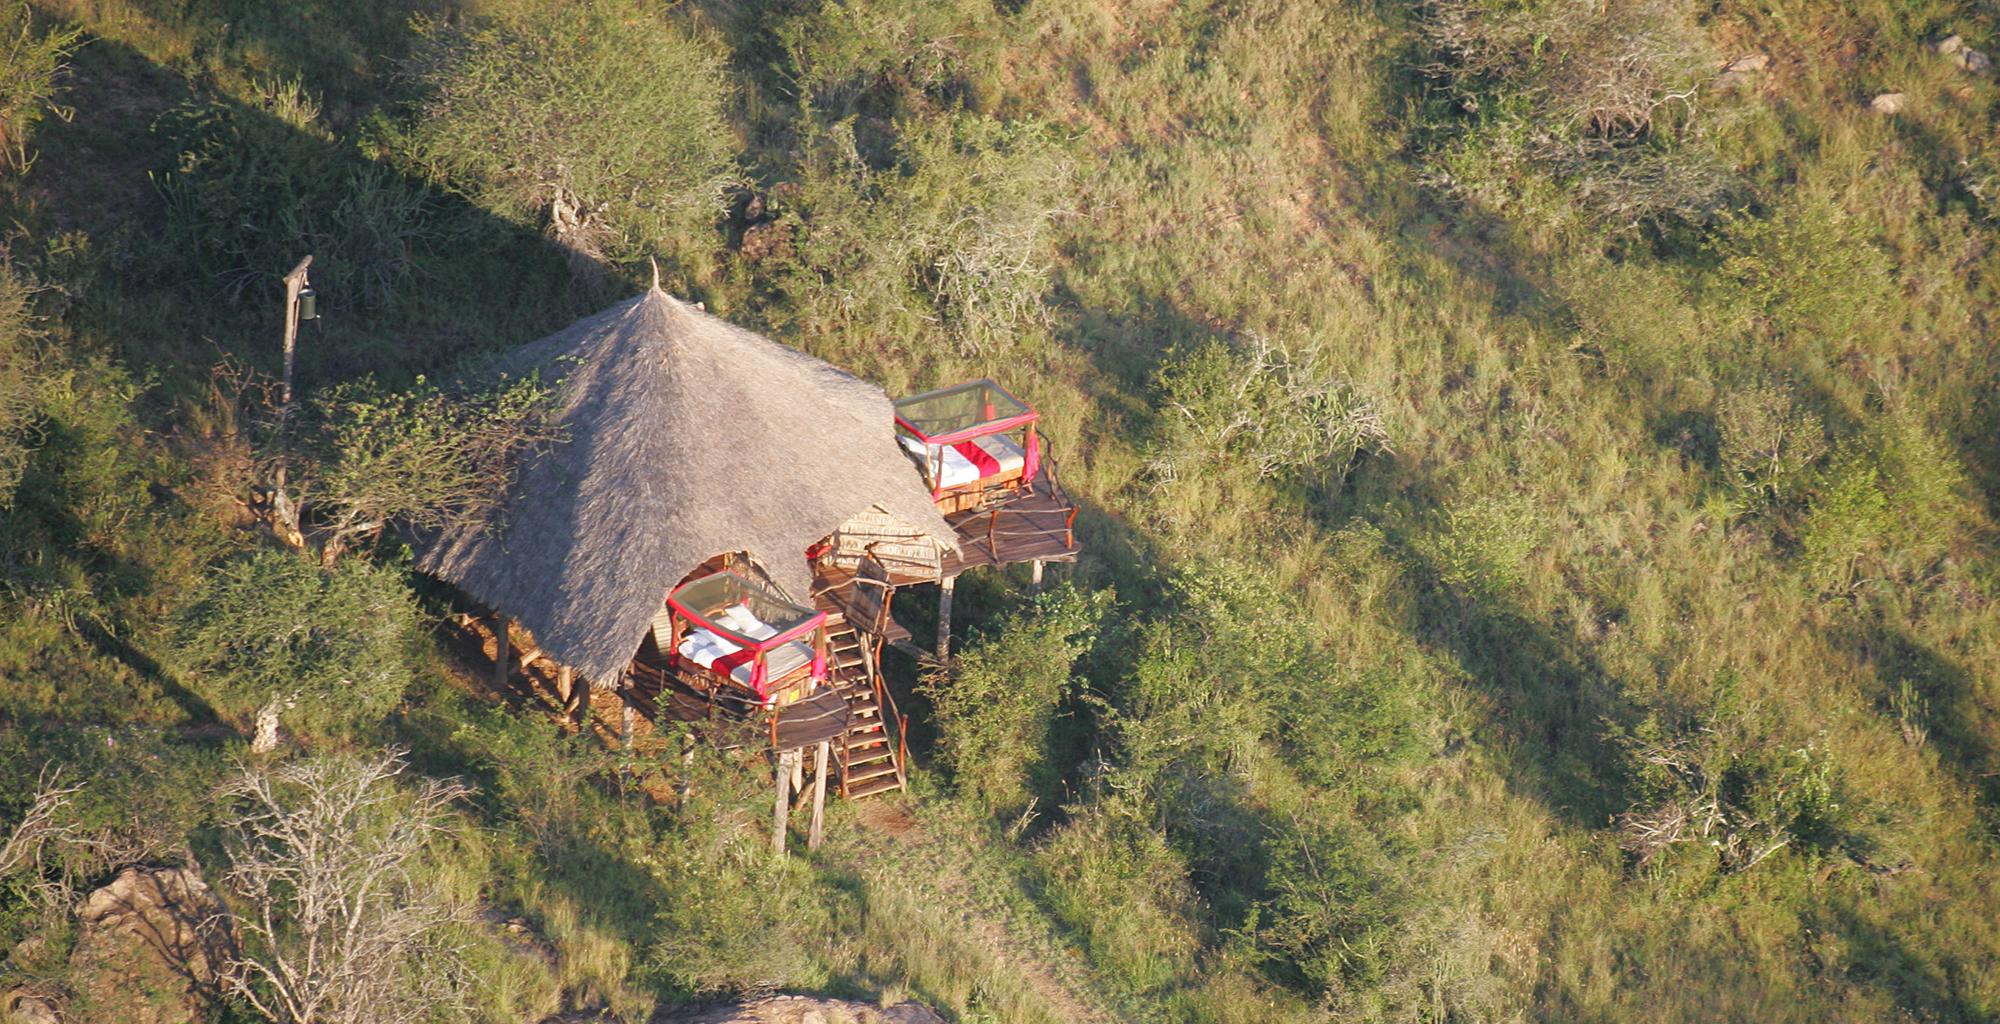 Kenya-Loisaba-Star-Beds-Aerial